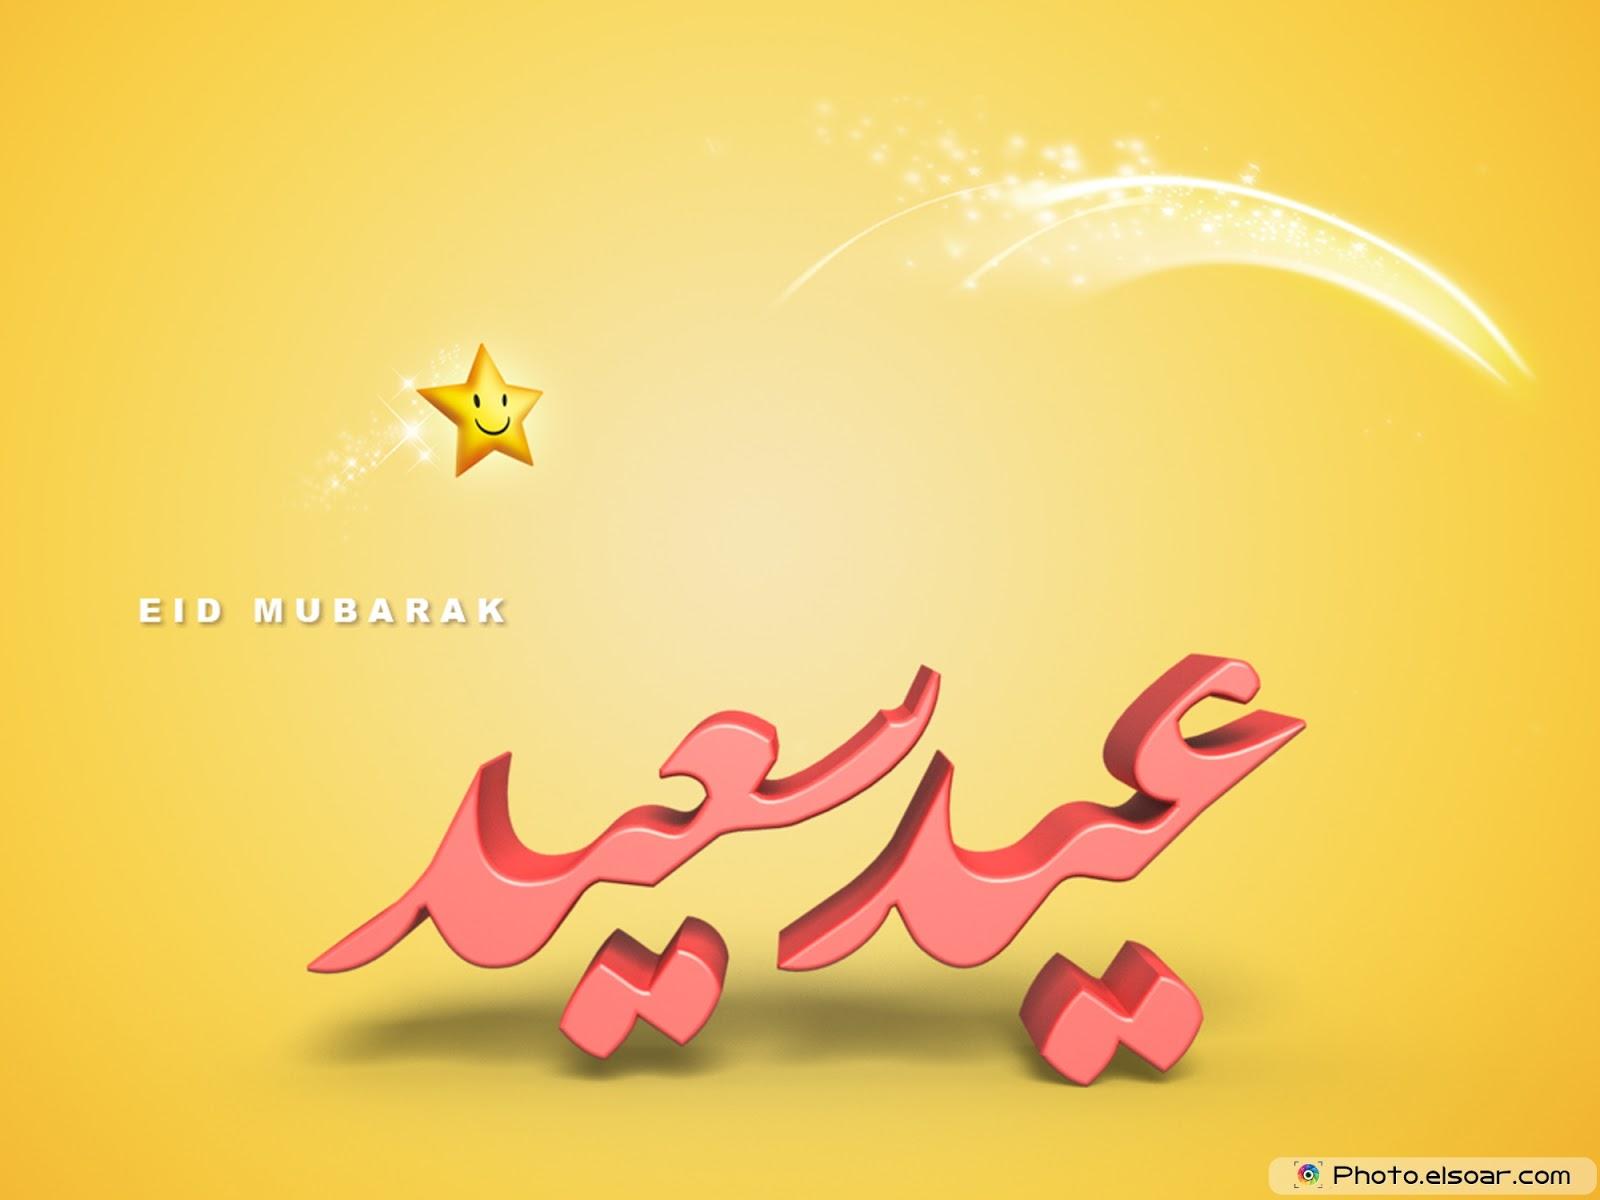 Eid mubarak pictures 2018 eid mubarak wishes greetings in hindiurdu cover photo m4hsunfo